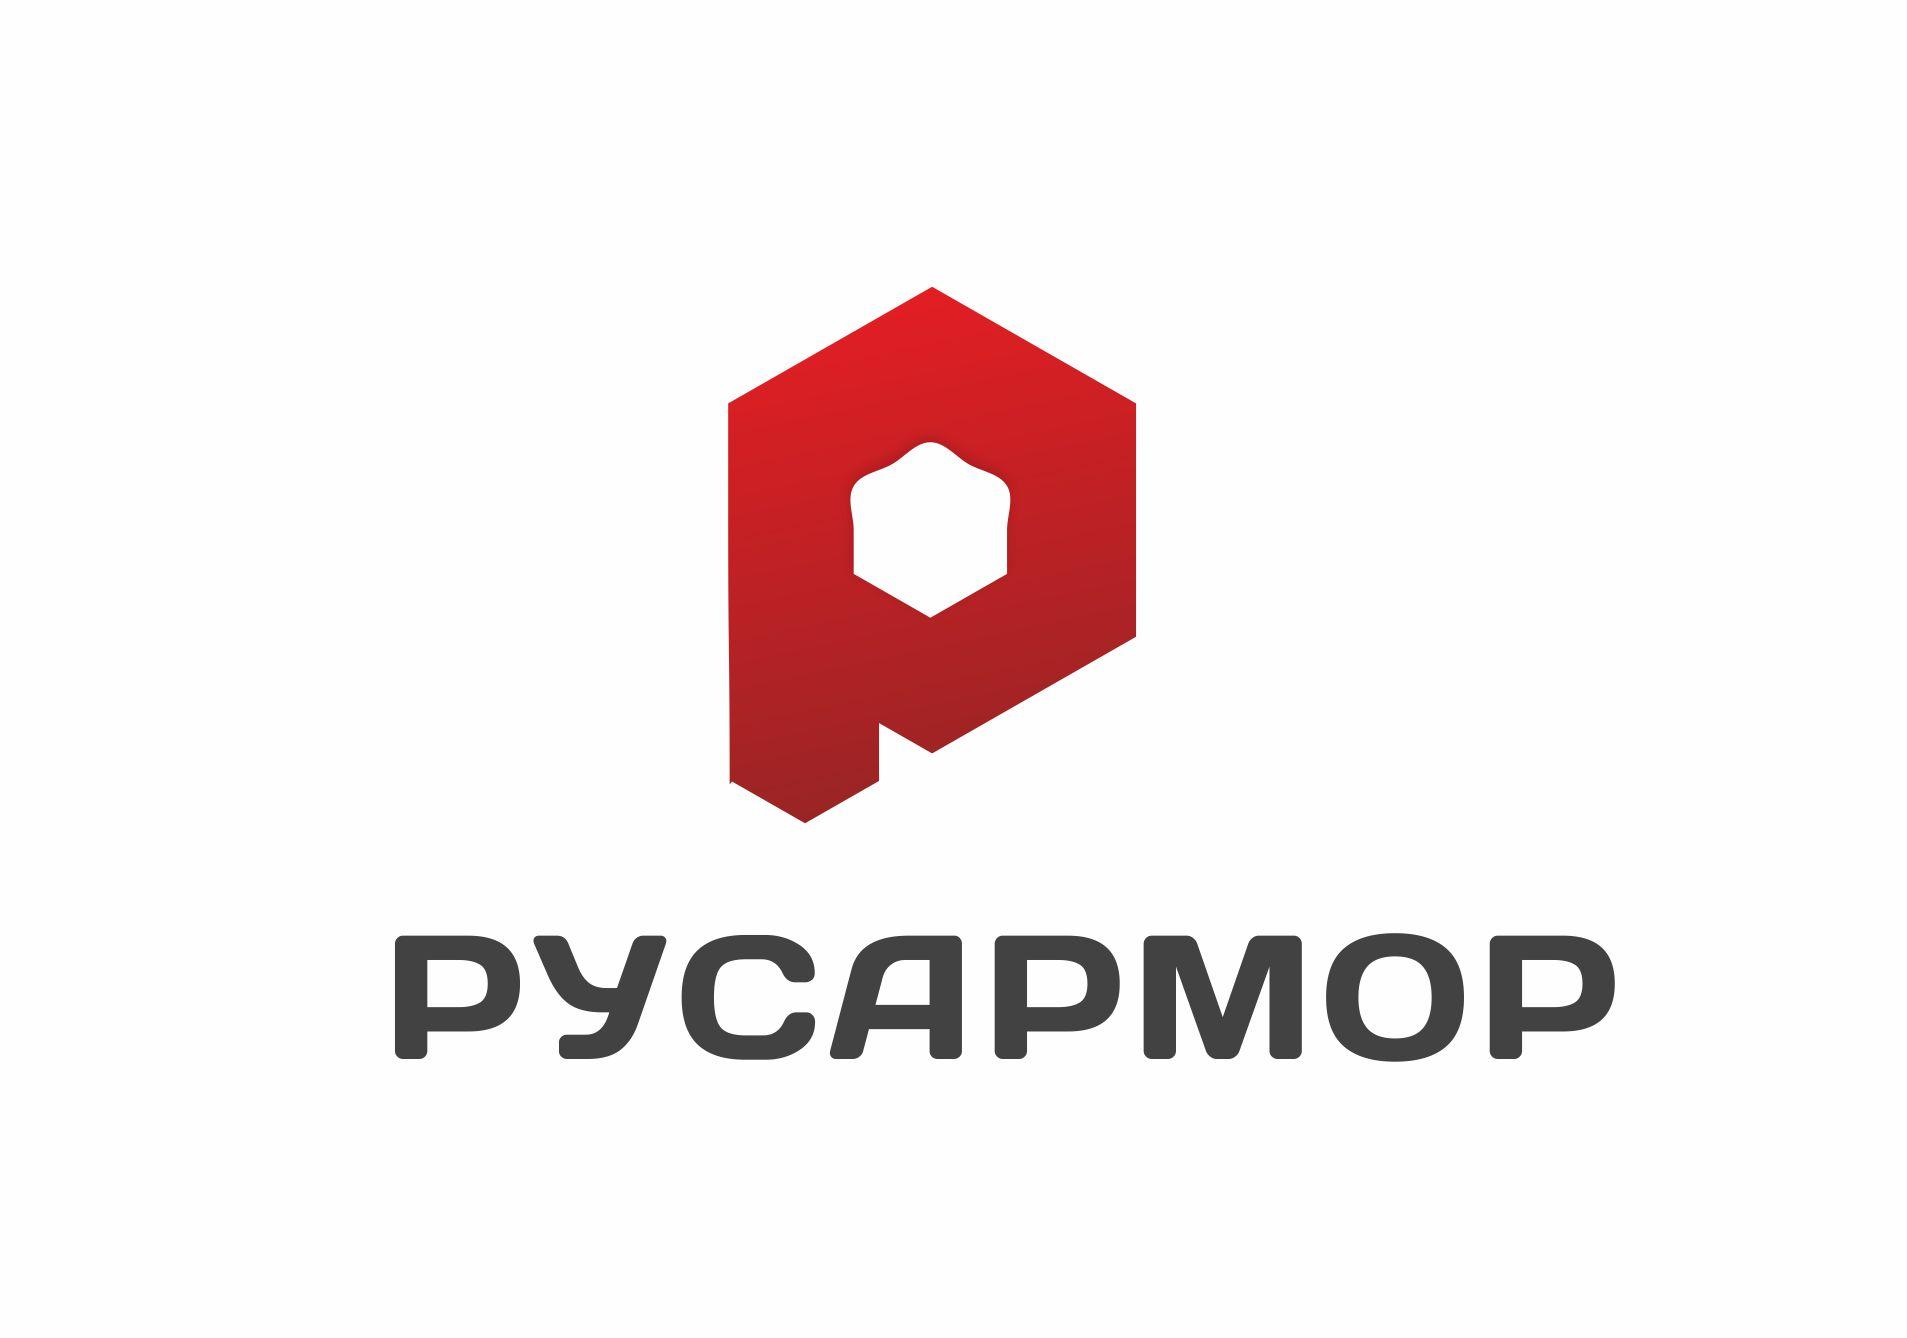 Разработка логотипа технологического стартапа РУСАРМОР фото f_4215a09ae8850441.jpg